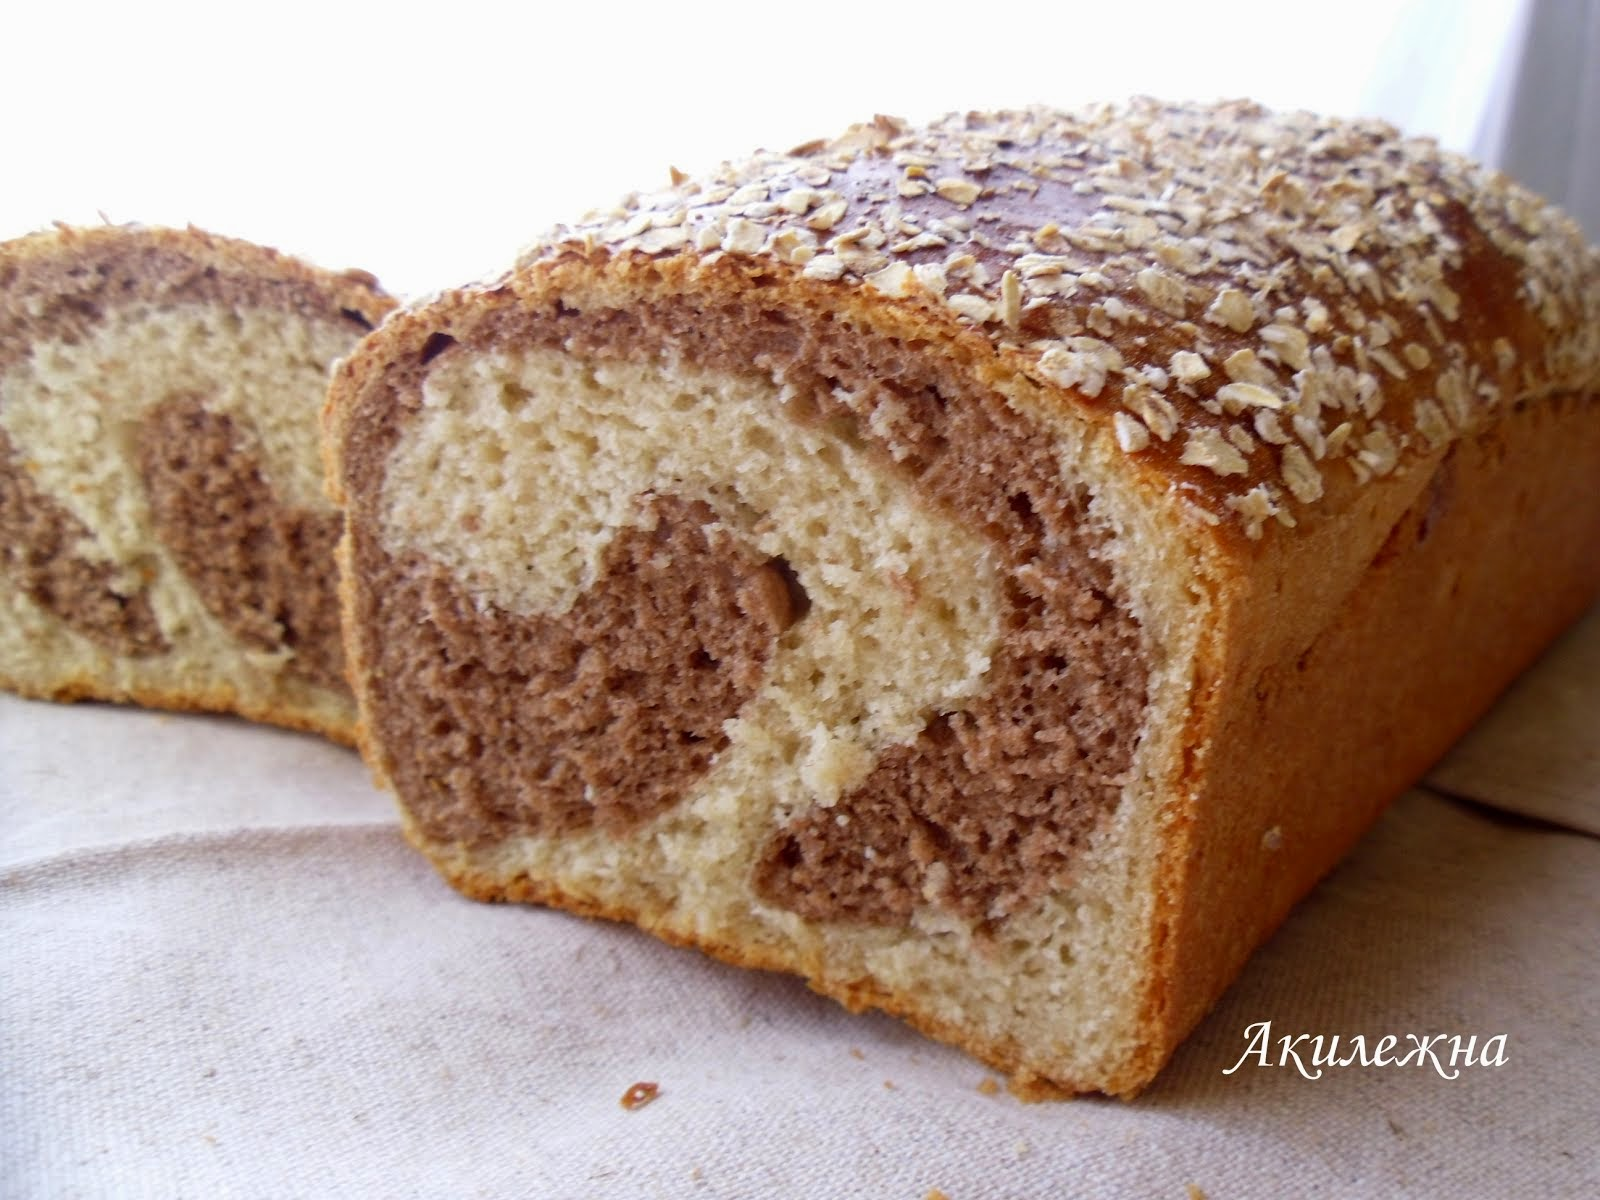 Мраморный ржаной хлеб